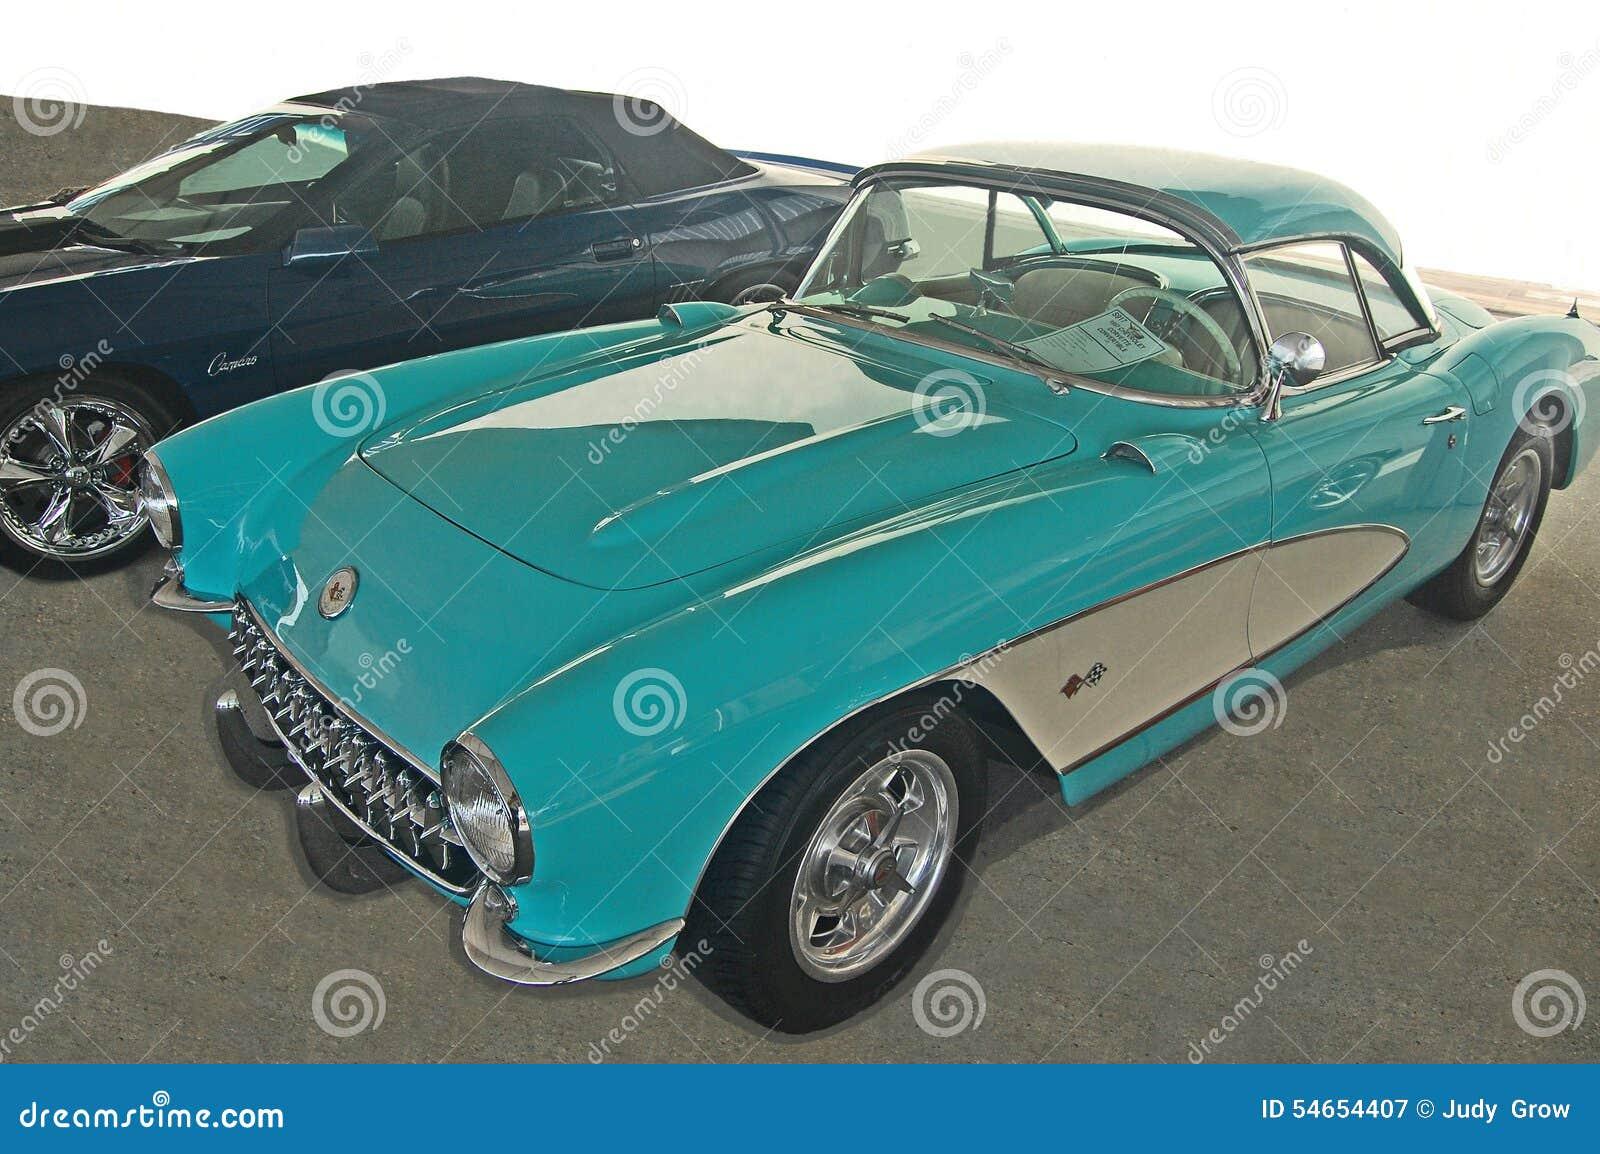 Kelebihan Chevrolet Corvette 1957 Top Model Tahun Ini